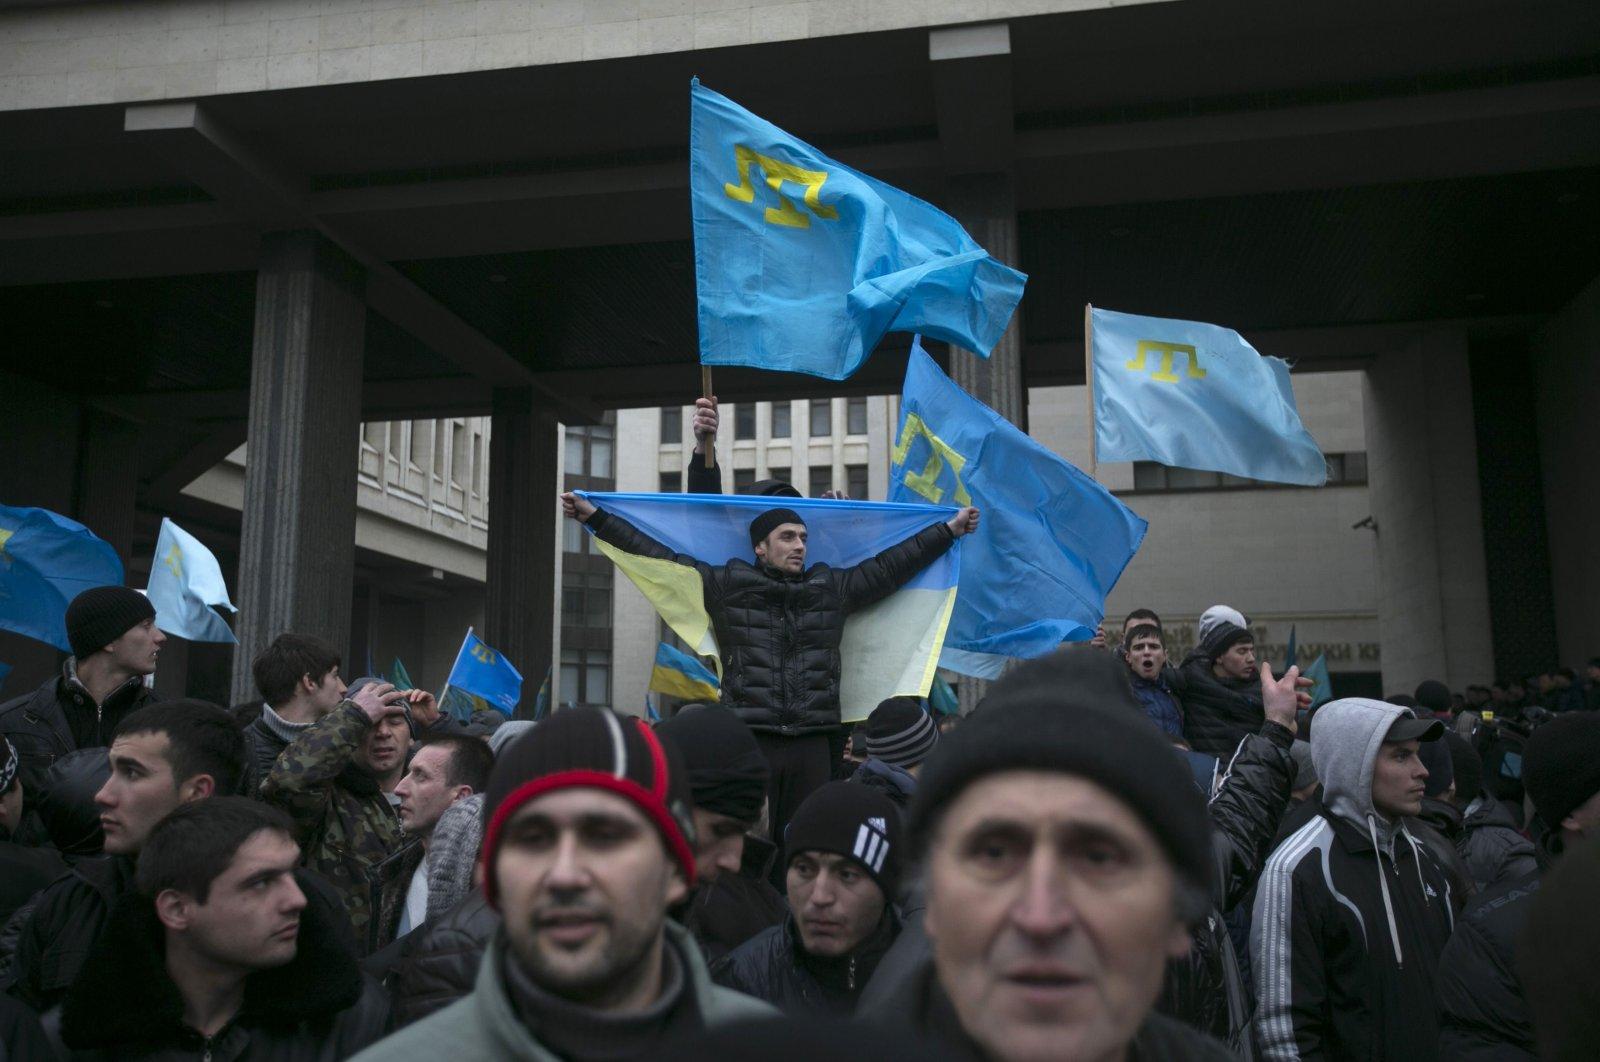 Crimean Tatars hold flags during rallies near the Crimean parliament building in Simferopol, Crimea, Ukraine, Feb. 26, 2014. (Reuters Photo)